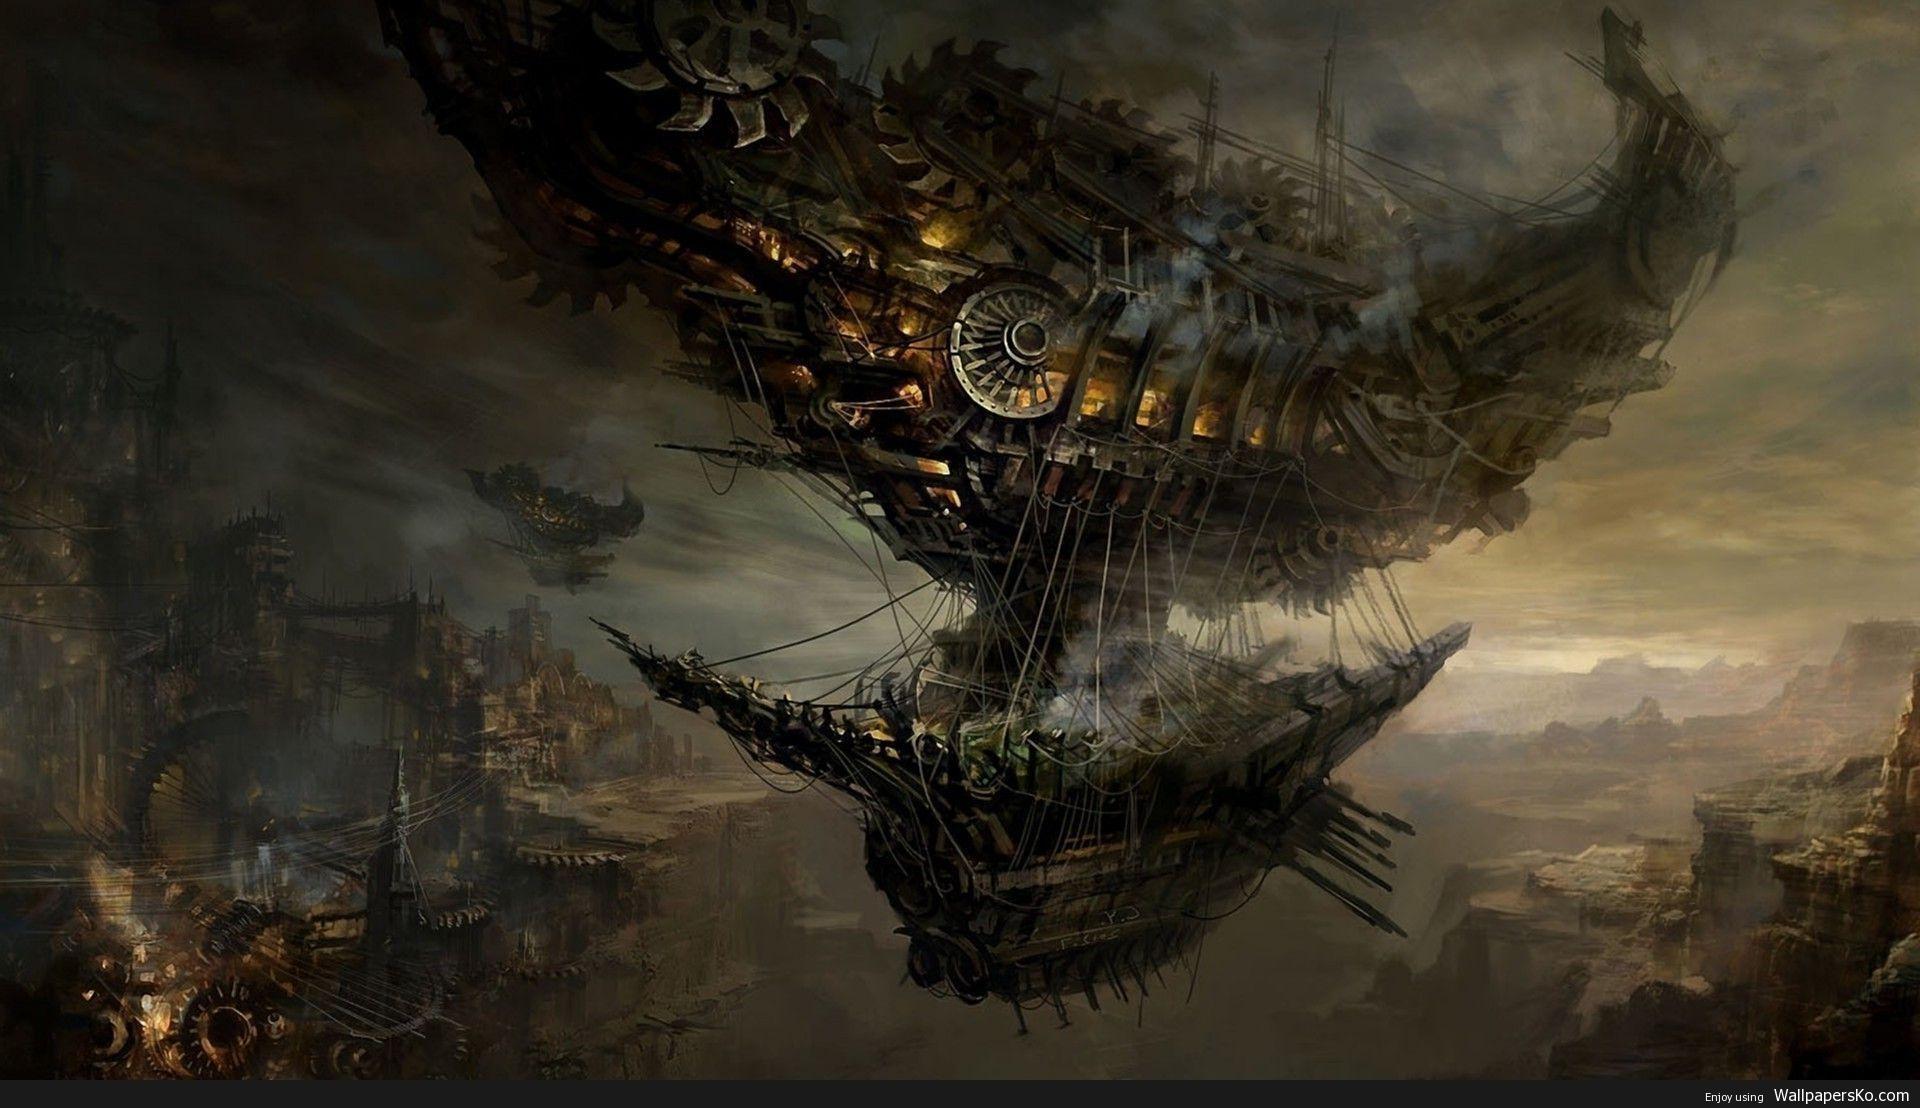 Steampunk Wallpaper 1080p